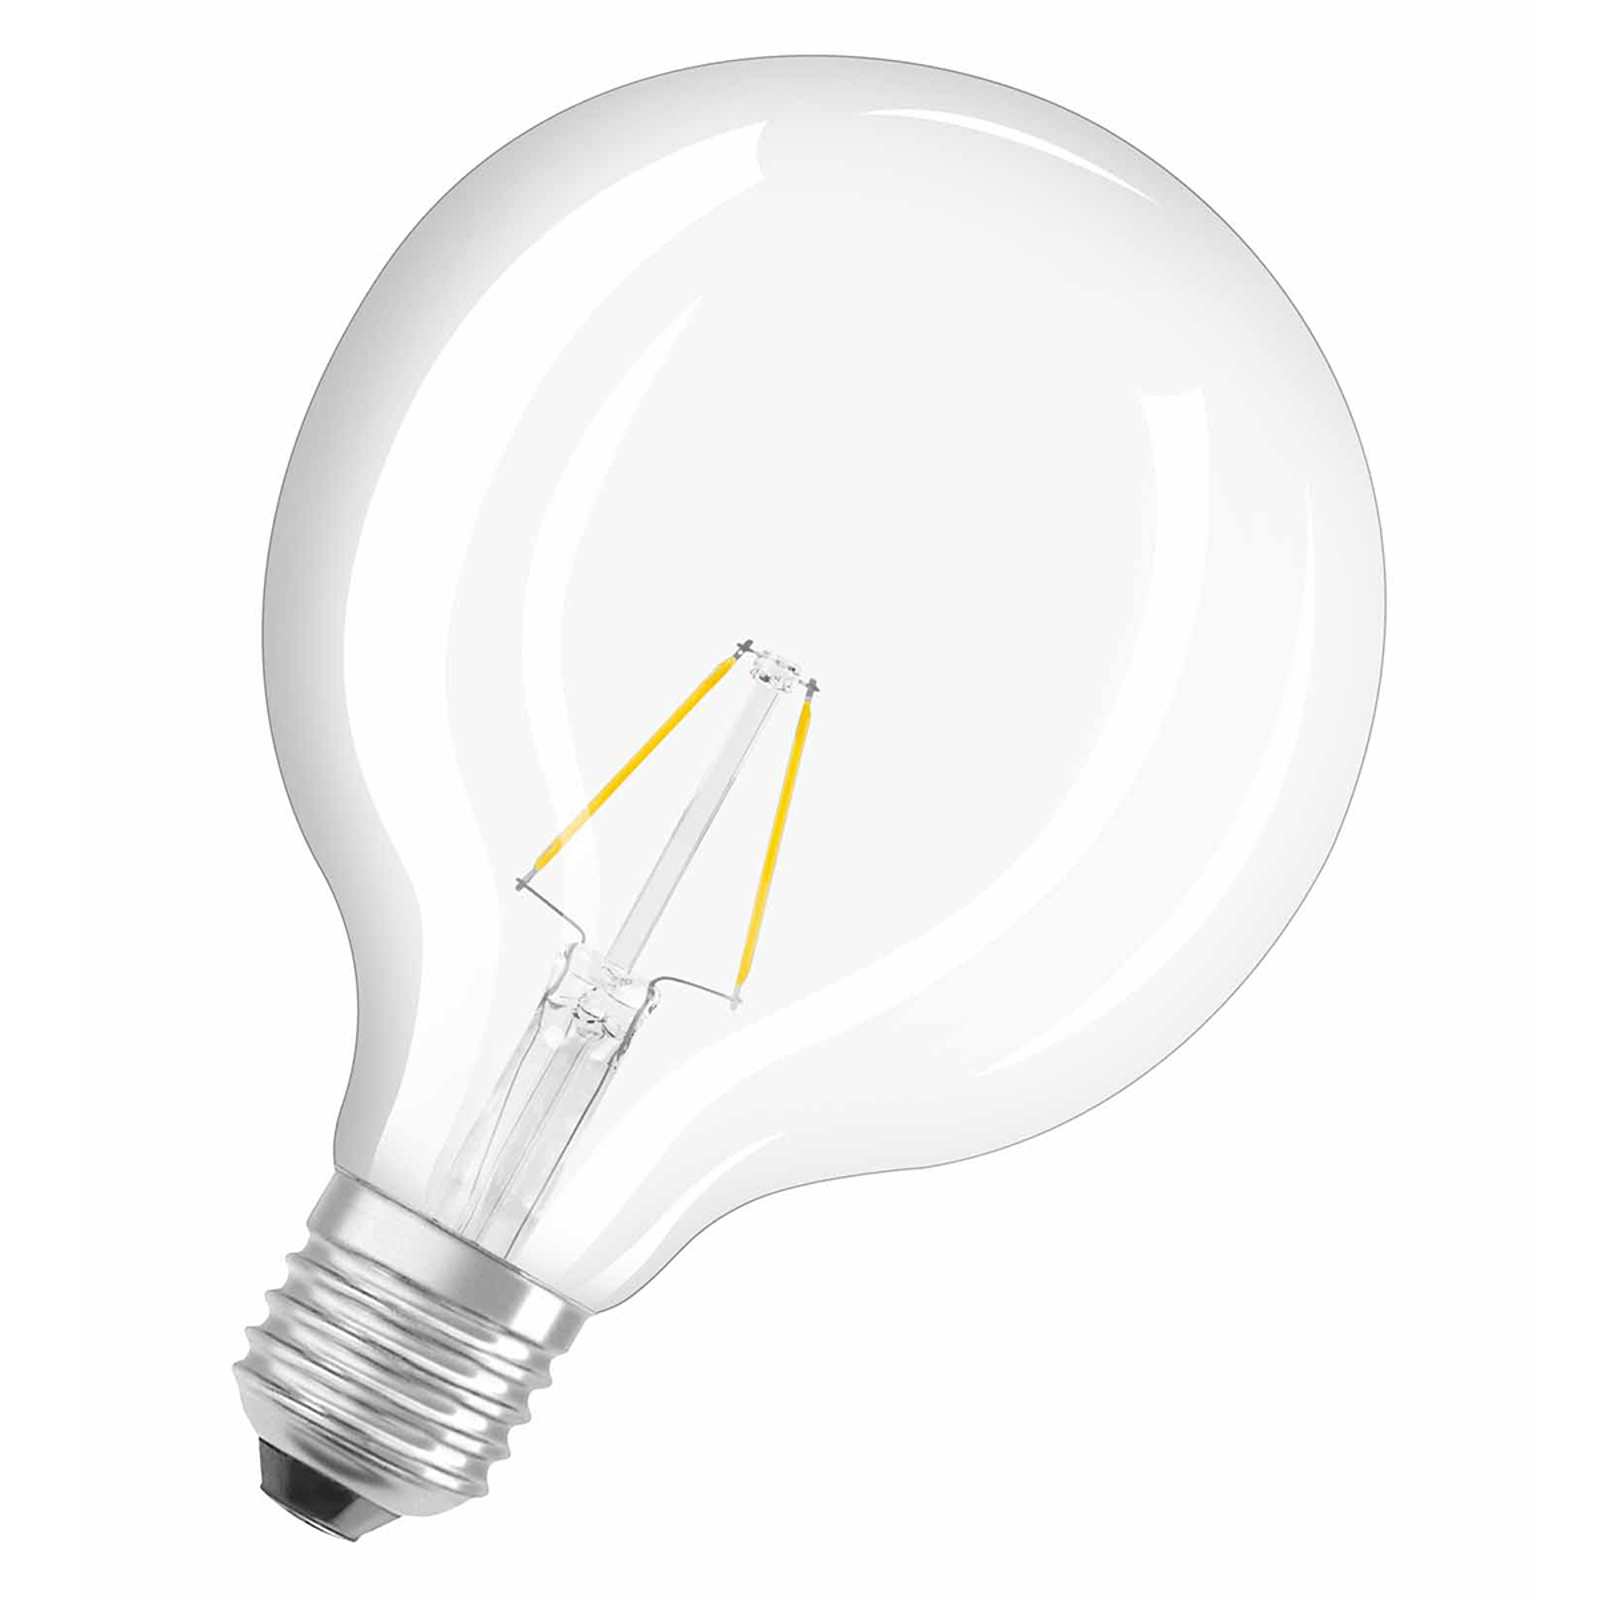 LED-Globelampe E27 2,5W 827 Retrofit